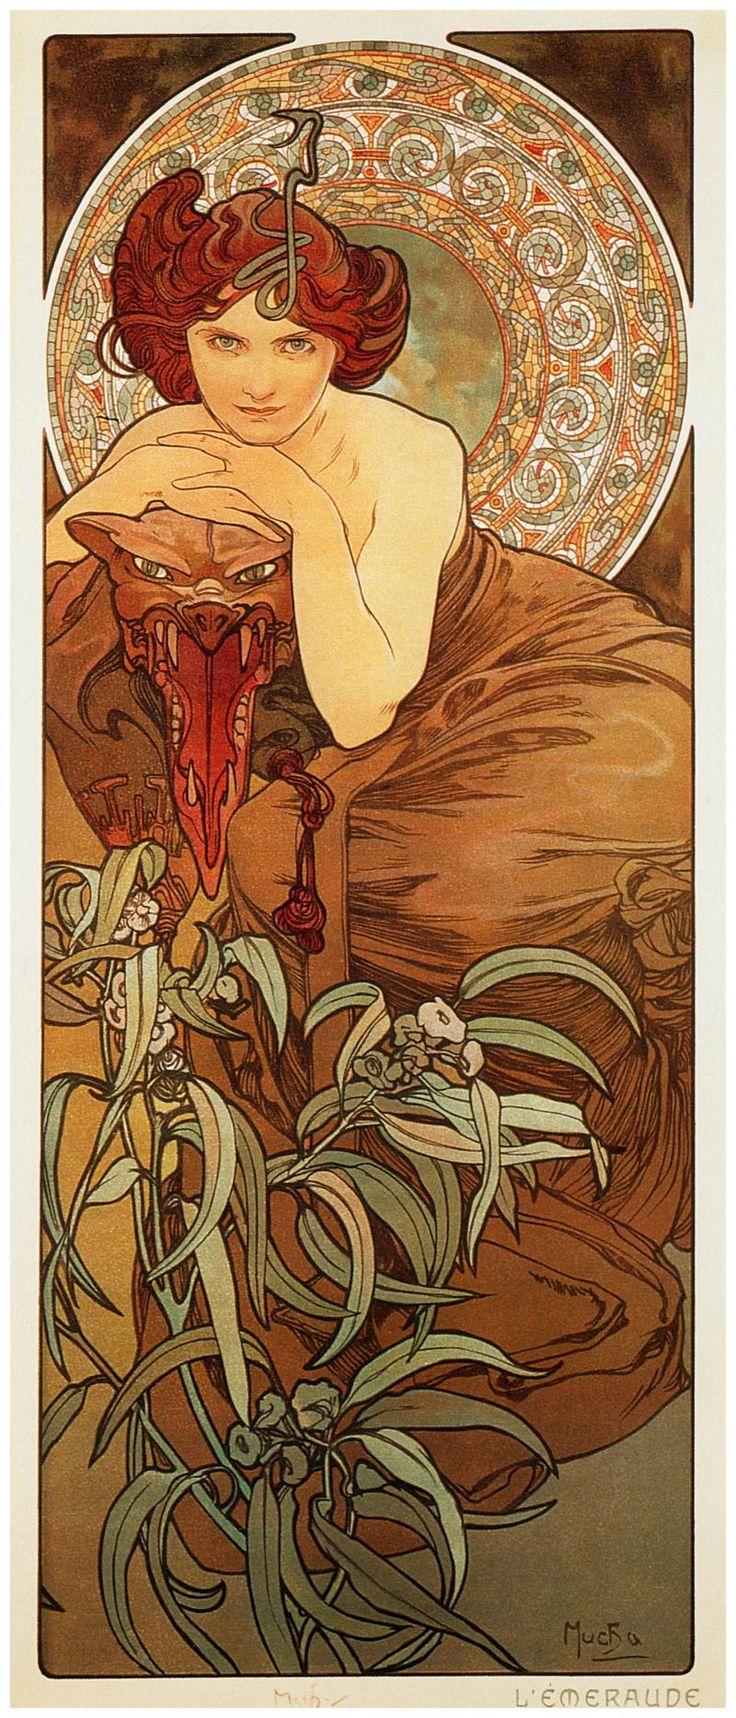 17 best images about art nouveau mucha on pinterest jewelry stores bijoux and renaissance. Black Bedroom Furniture Sets. Home Design Ideas